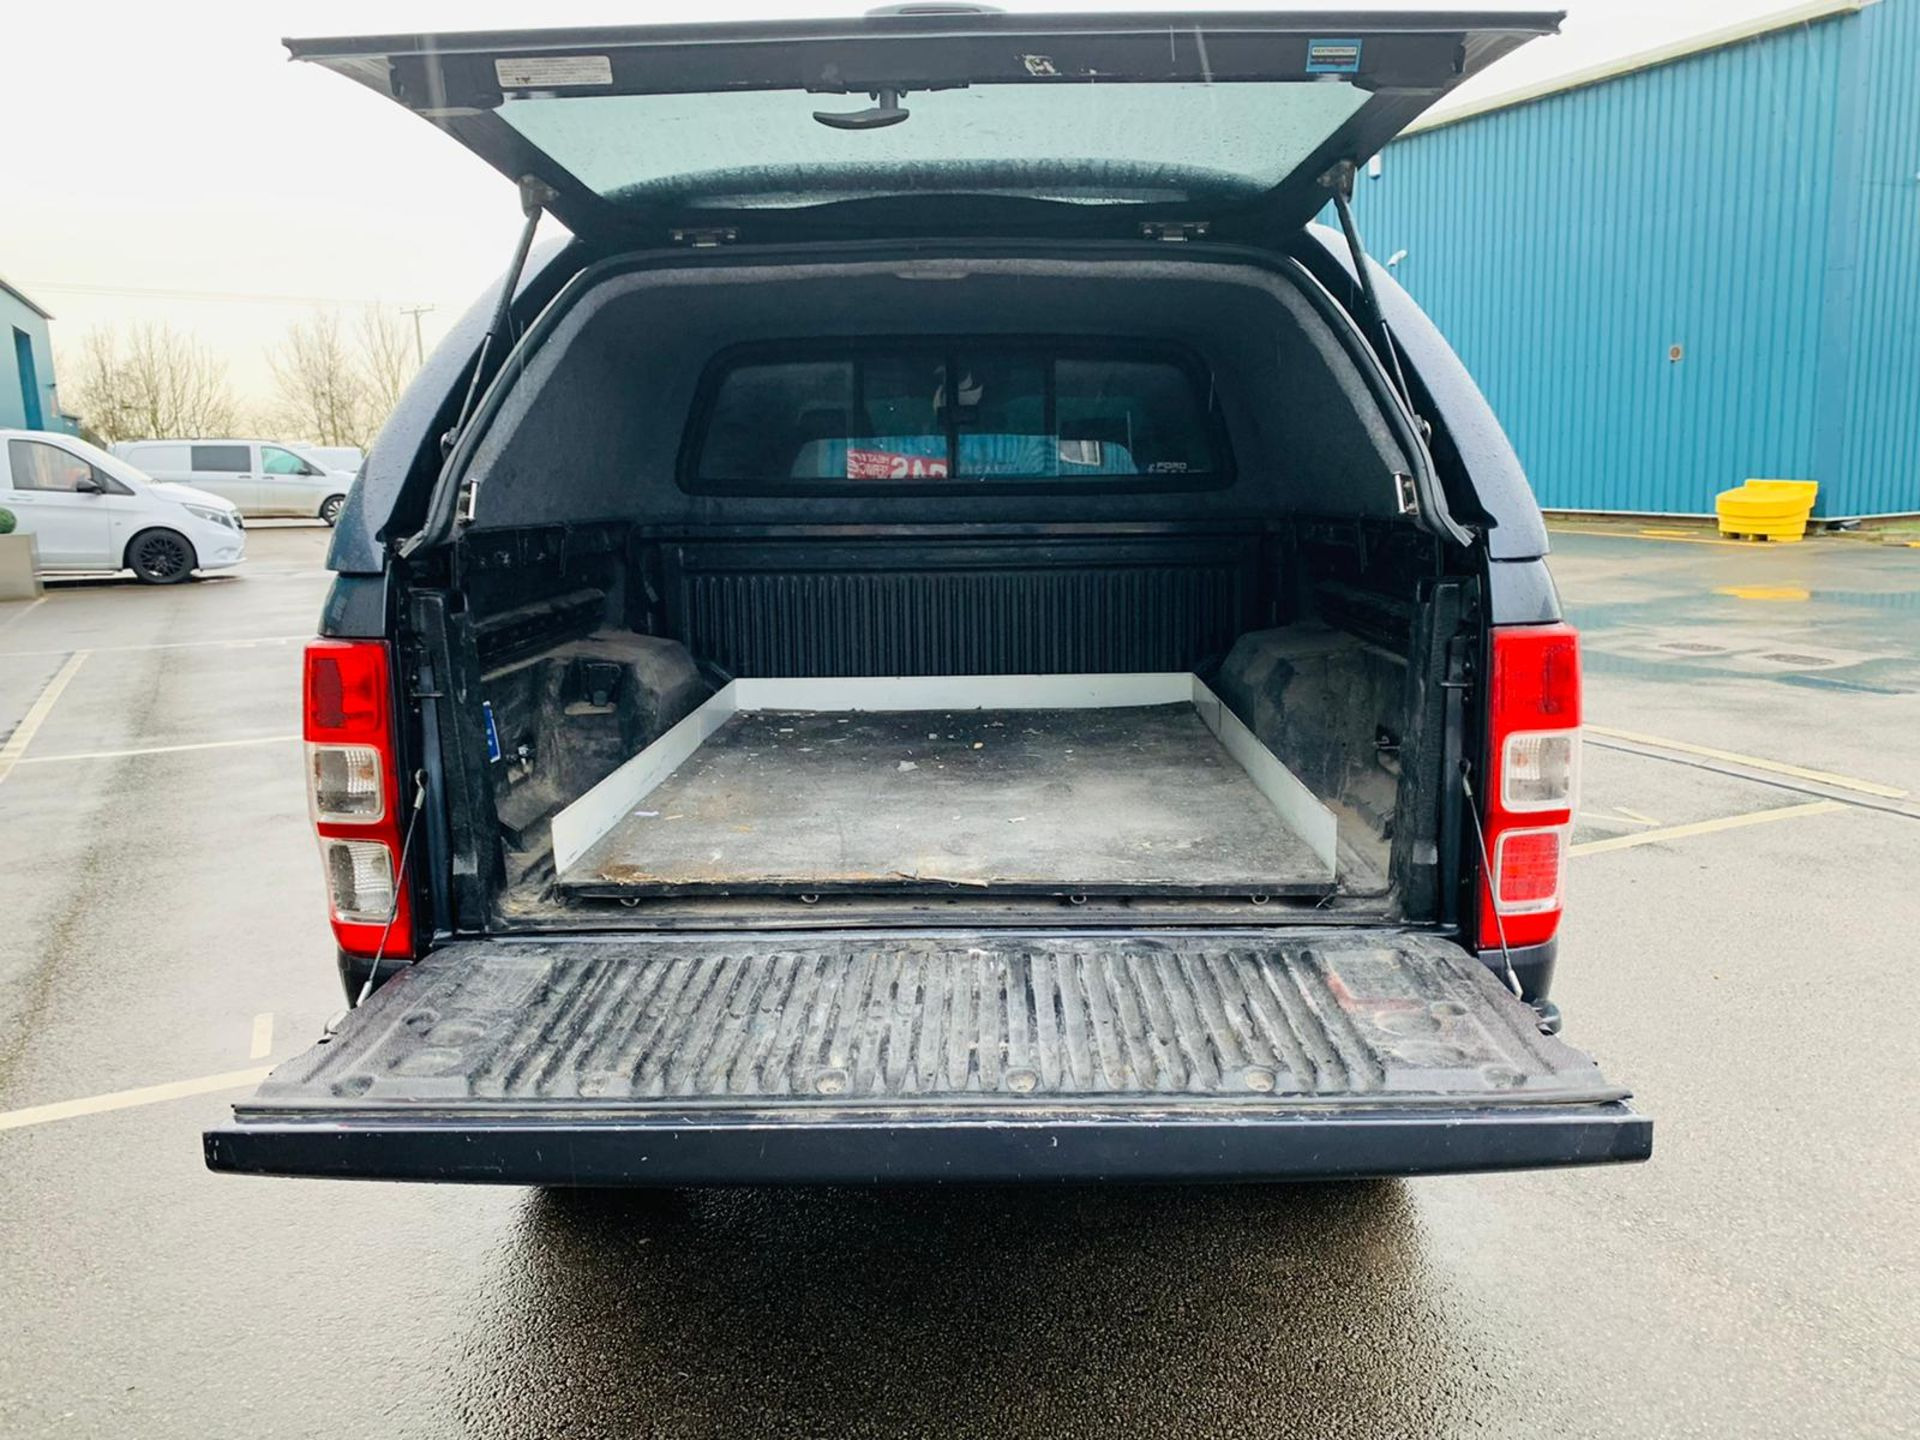 (RESERVE MET) Ford Ranger 2.2 TDCI LTD 4x4 Double Cab 2017 17 Reg - Reversing Cam -Leather - Sat Nav - Image 11 of 32